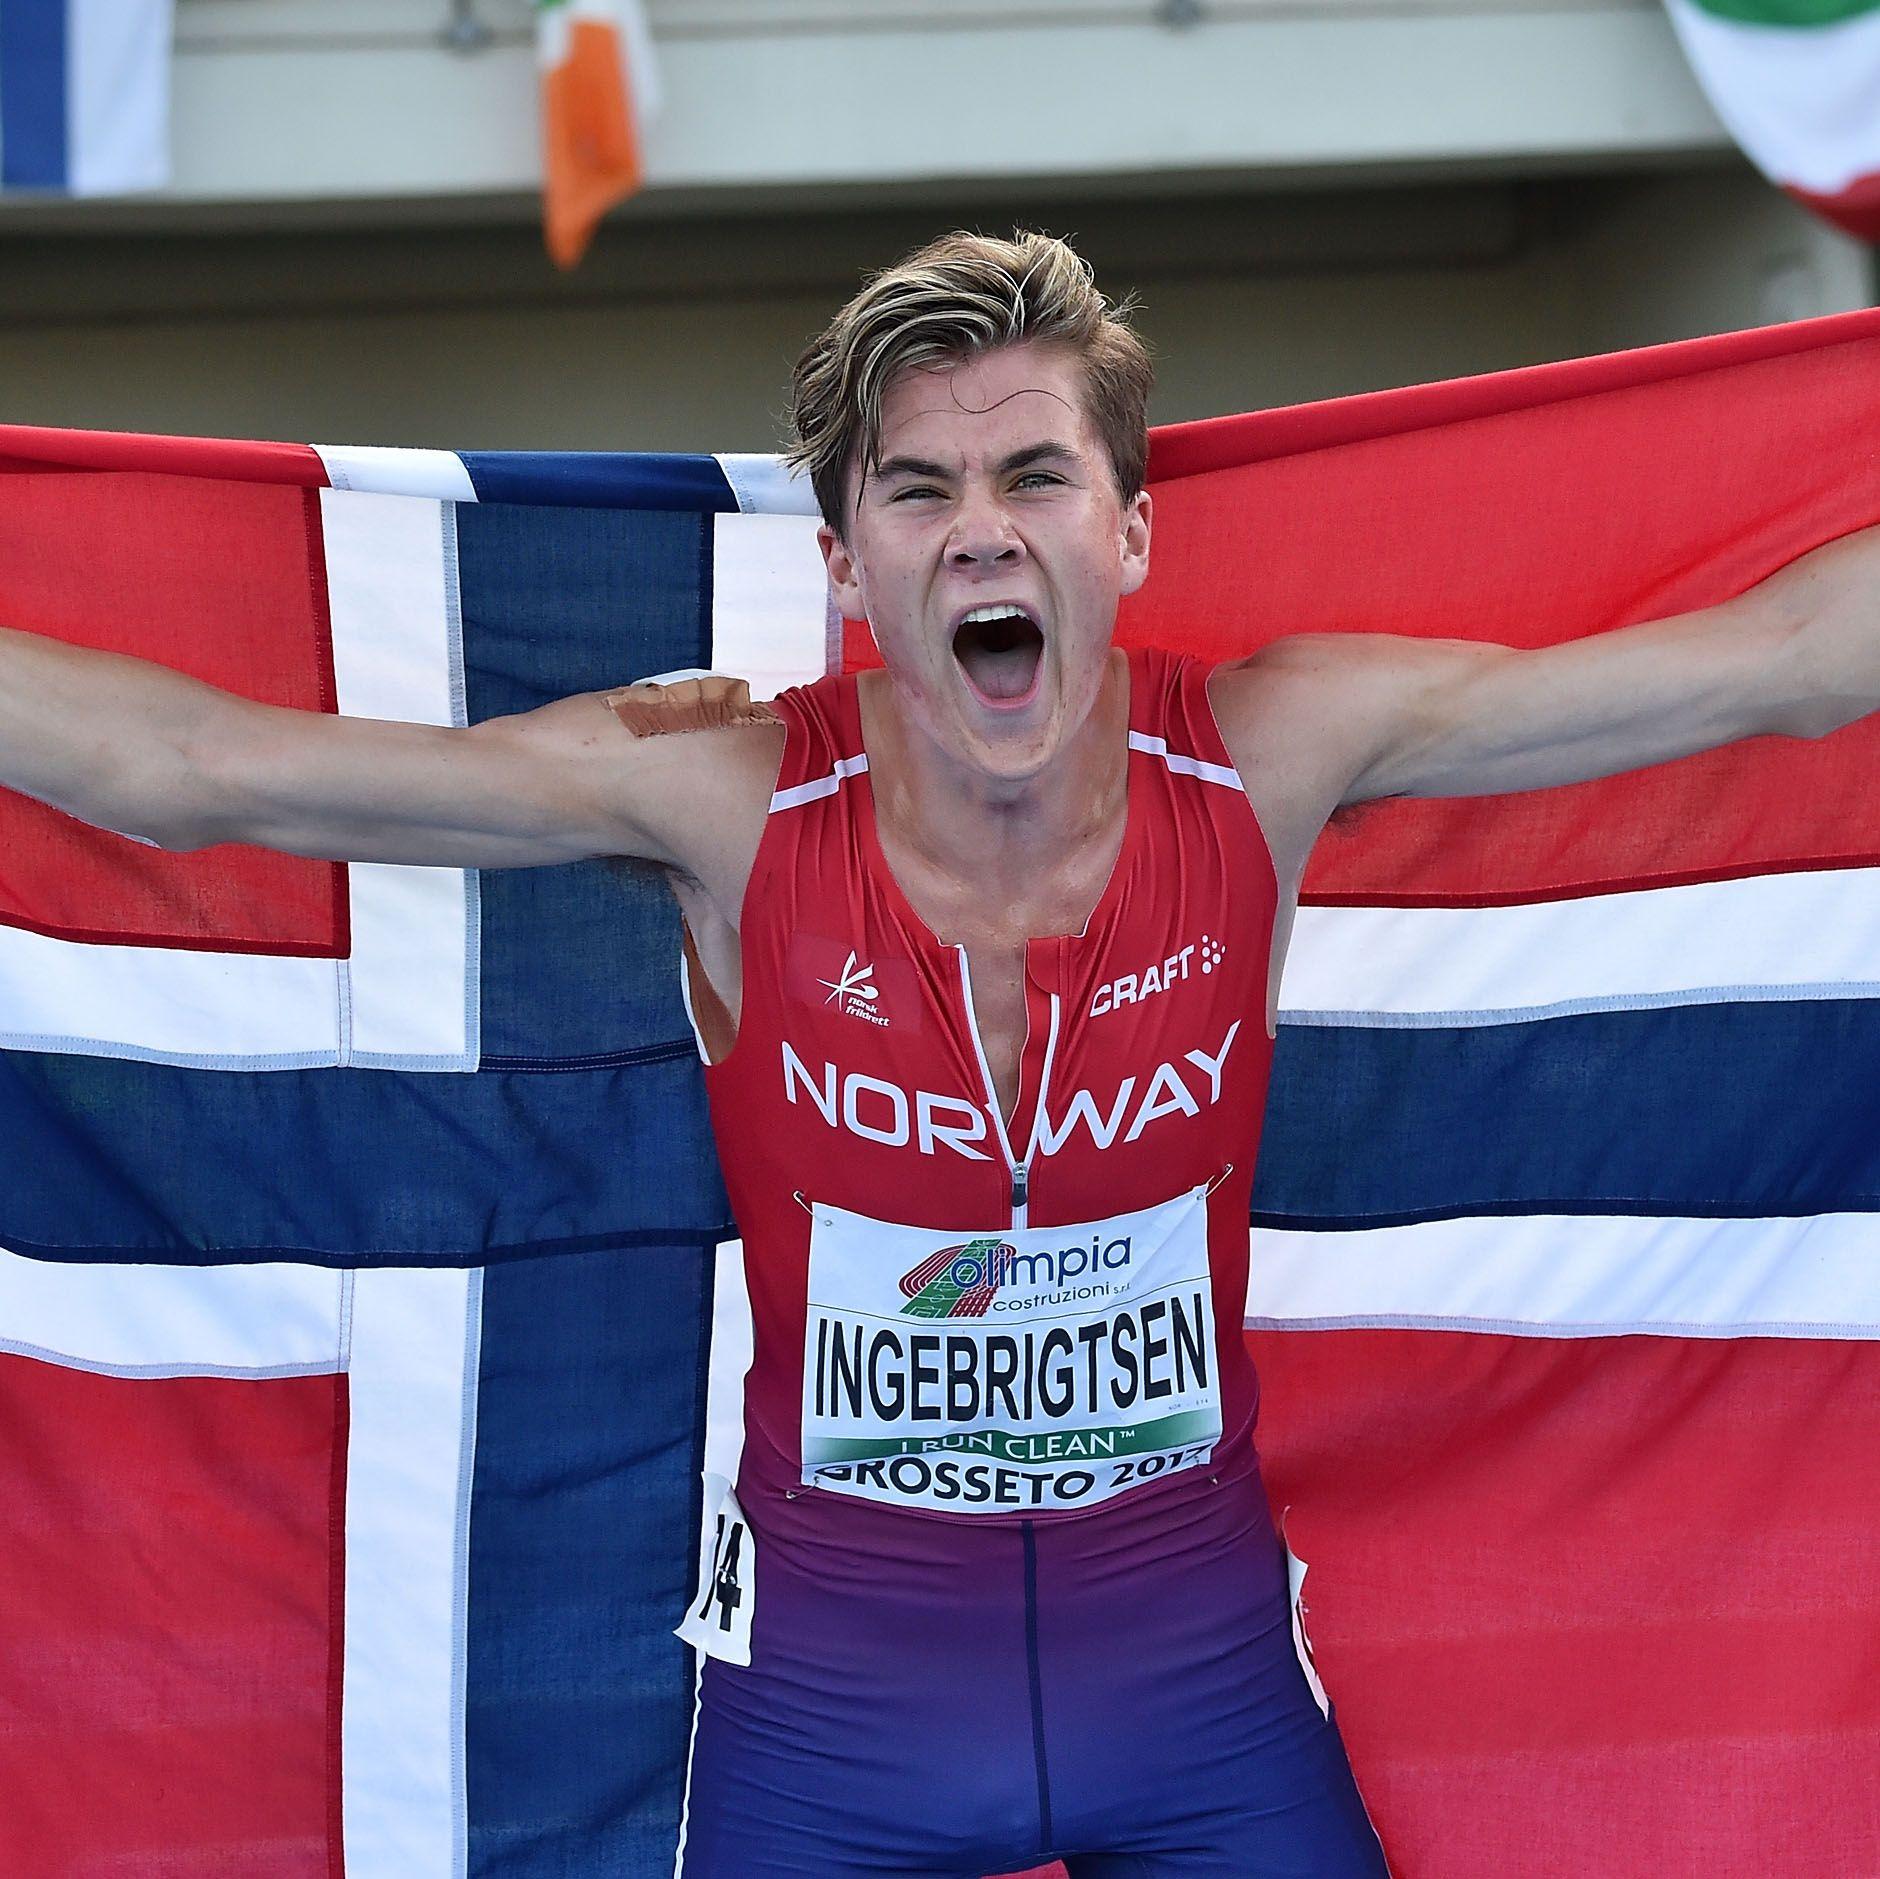 Norwegian Track Phenom Jakob Ingebrigtsen Breaks Junior 1500 Meter World Record